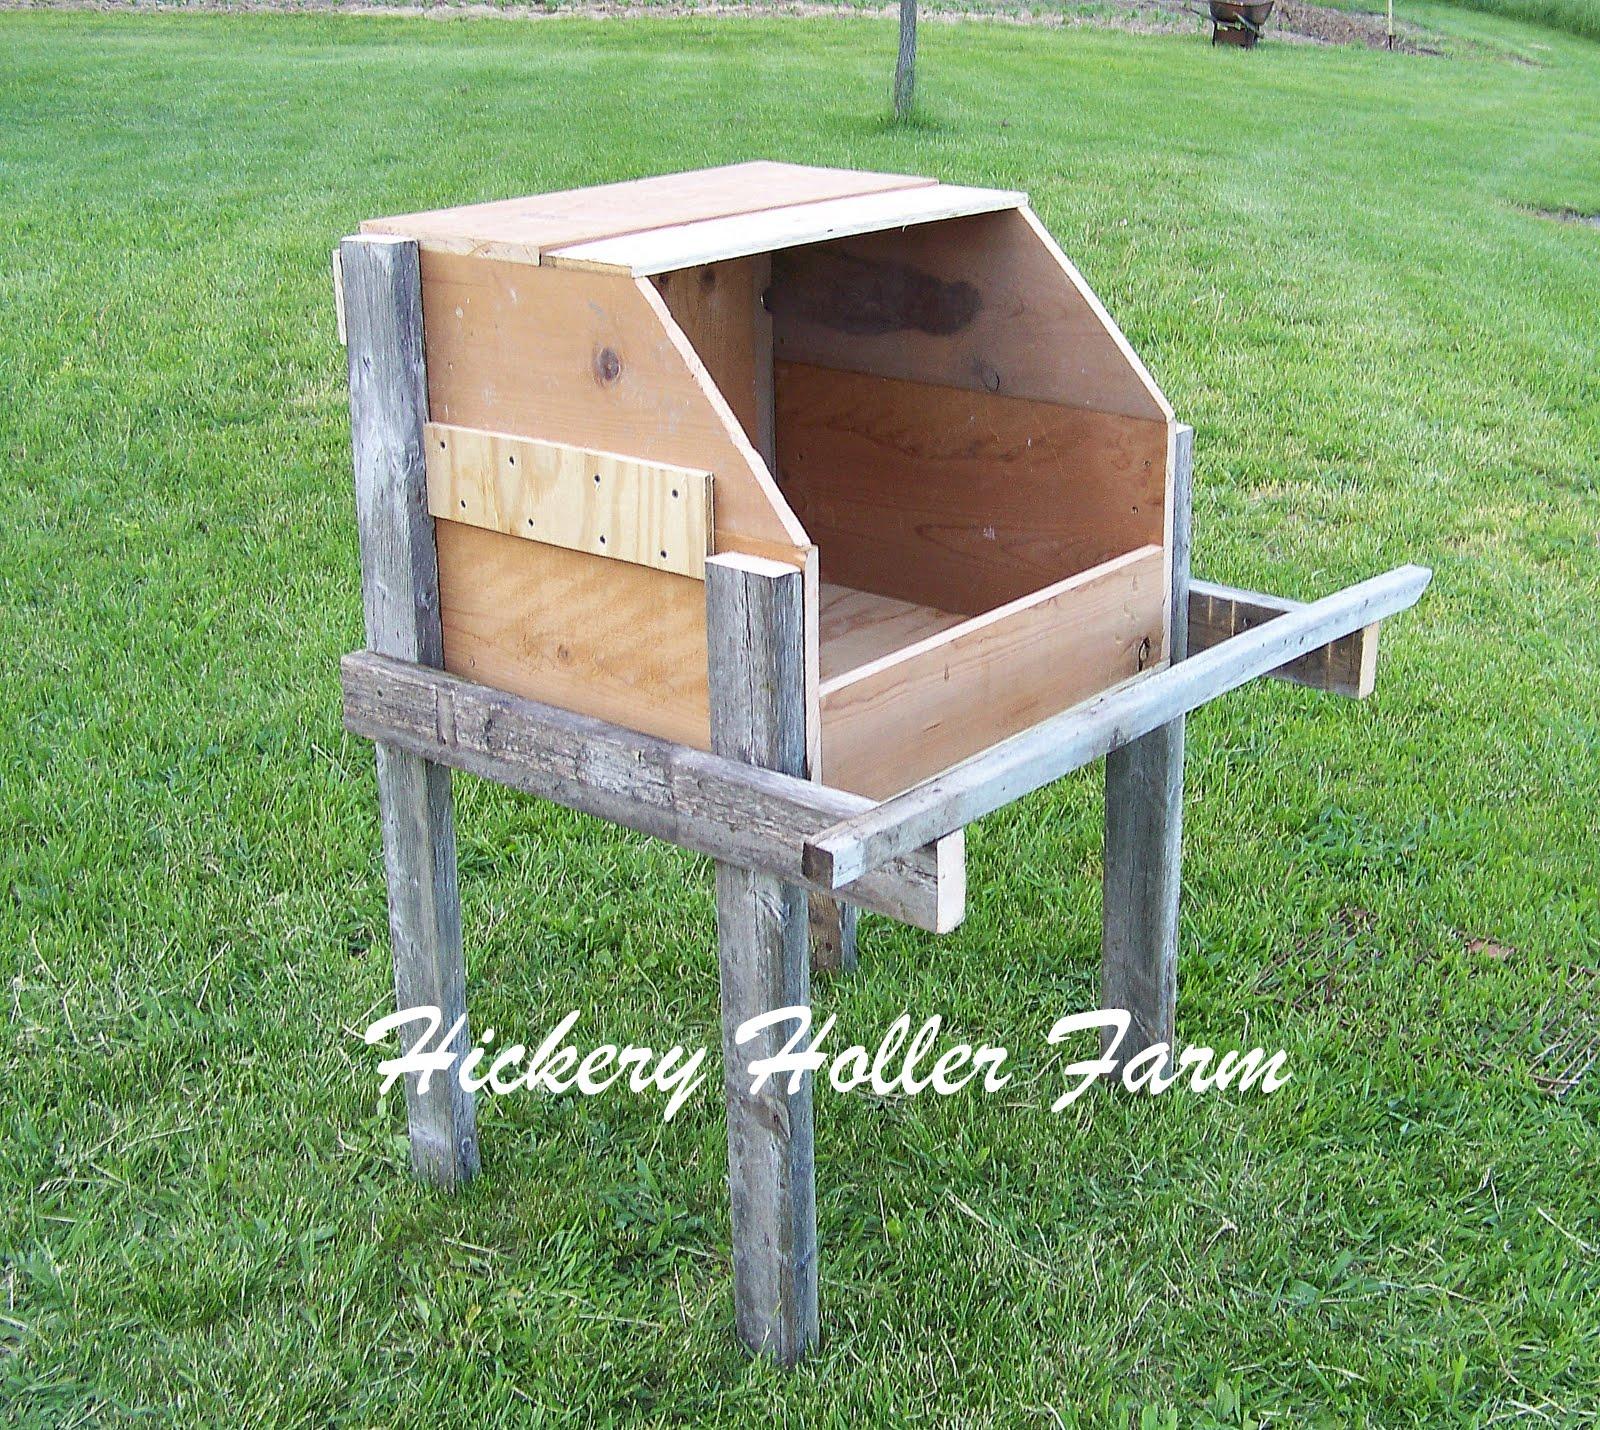 hickery holler farm turkey nesting boxes